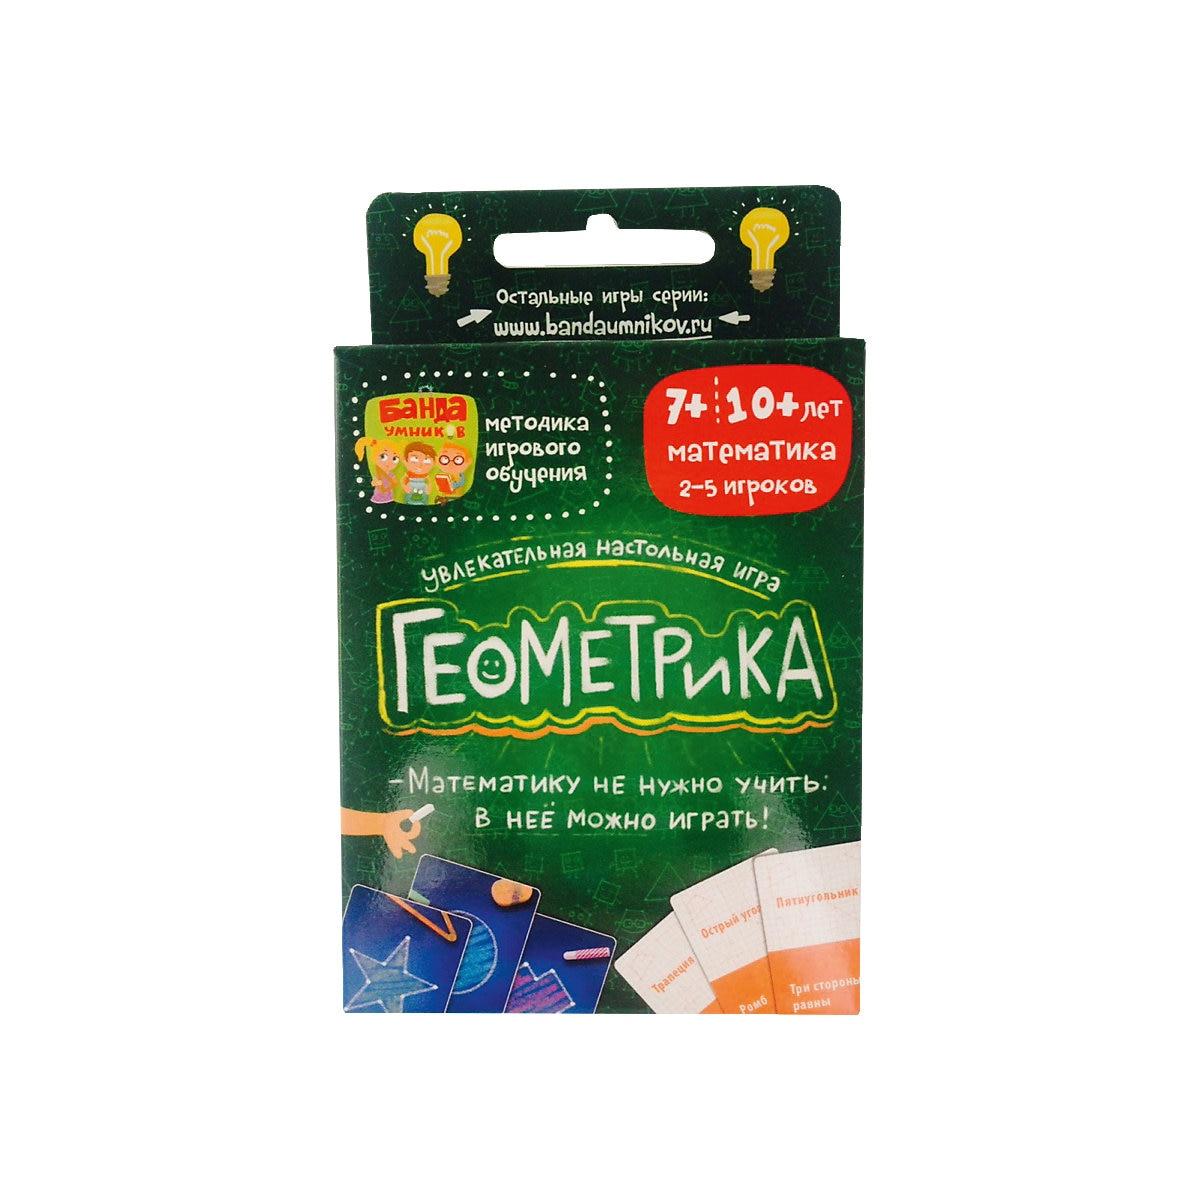 Banda umnikov Card Games 4079599 educational toys board game toy boys girls children training cards training central broholmer tricks training broholmer tricks games training tracker workbook includes broholmer multi level tricks games agility part 2